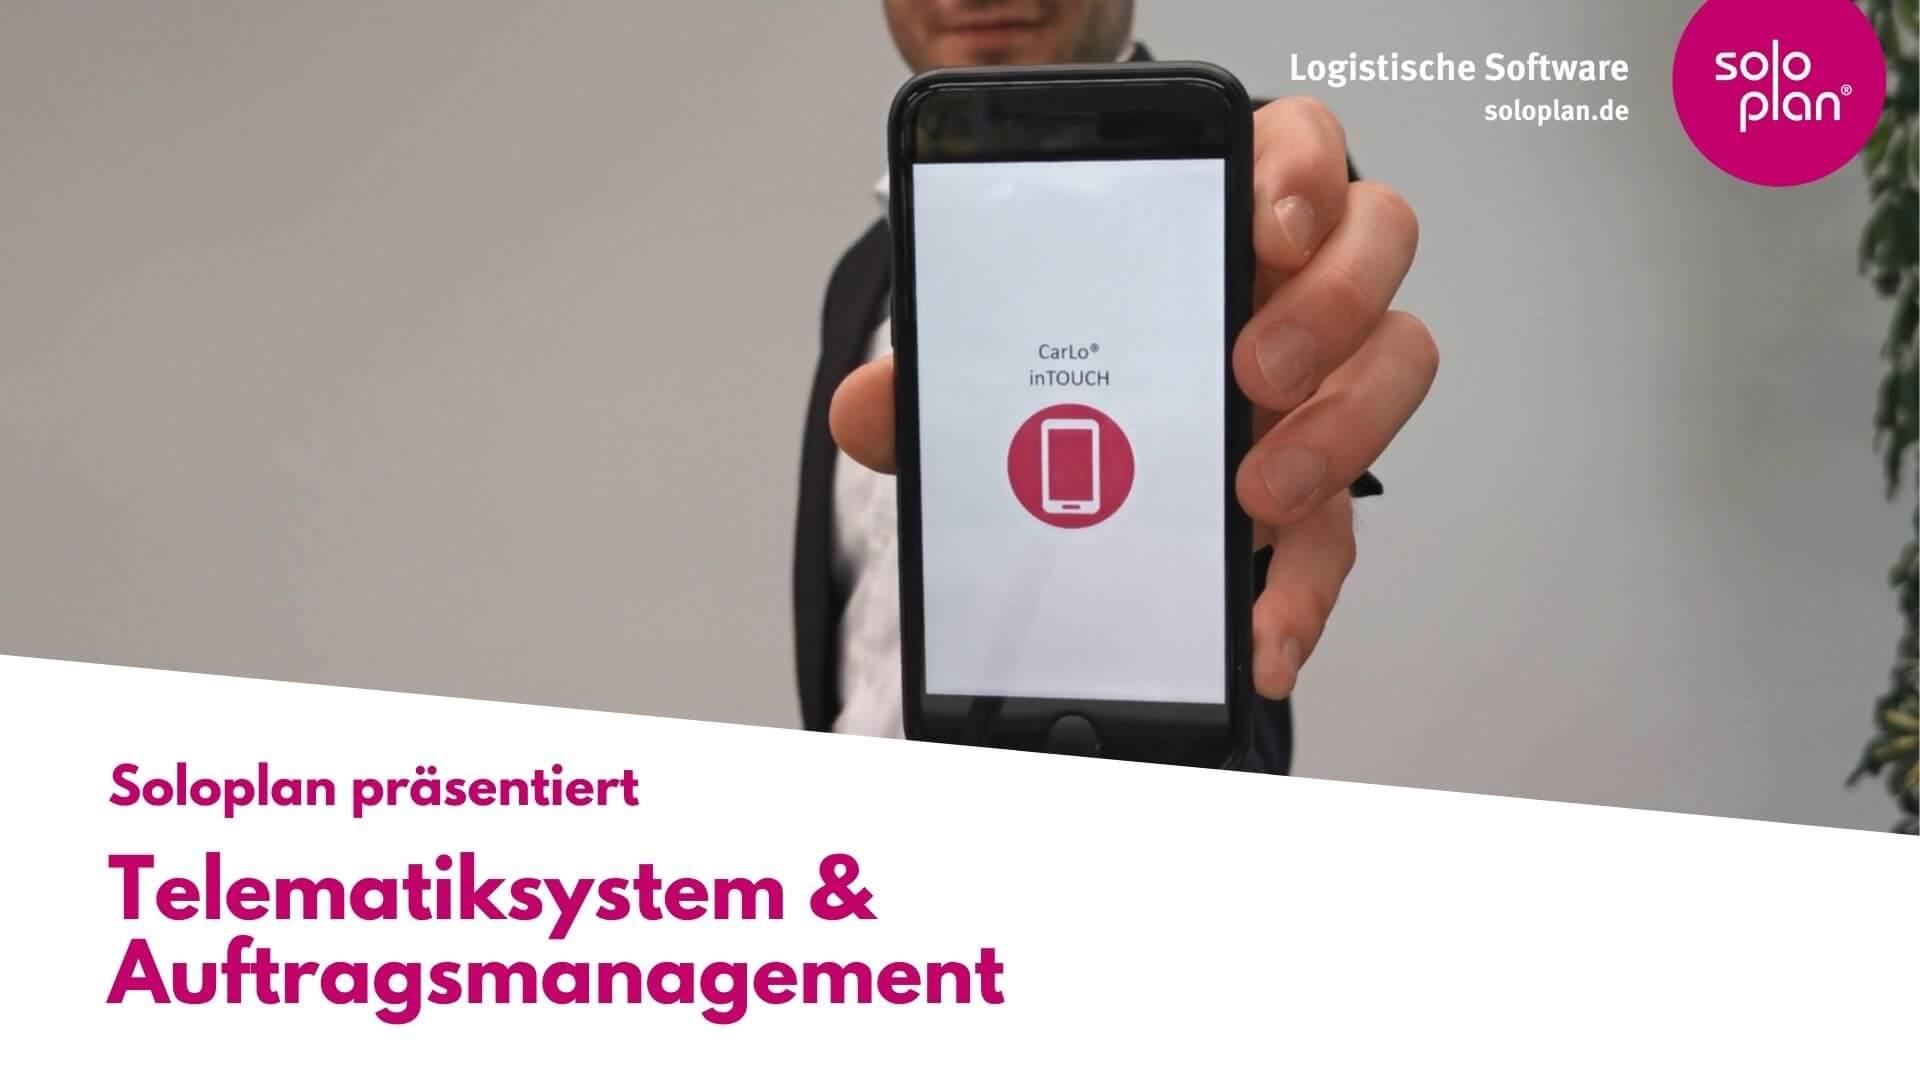 Telematiksystem & Auftragsmanagement